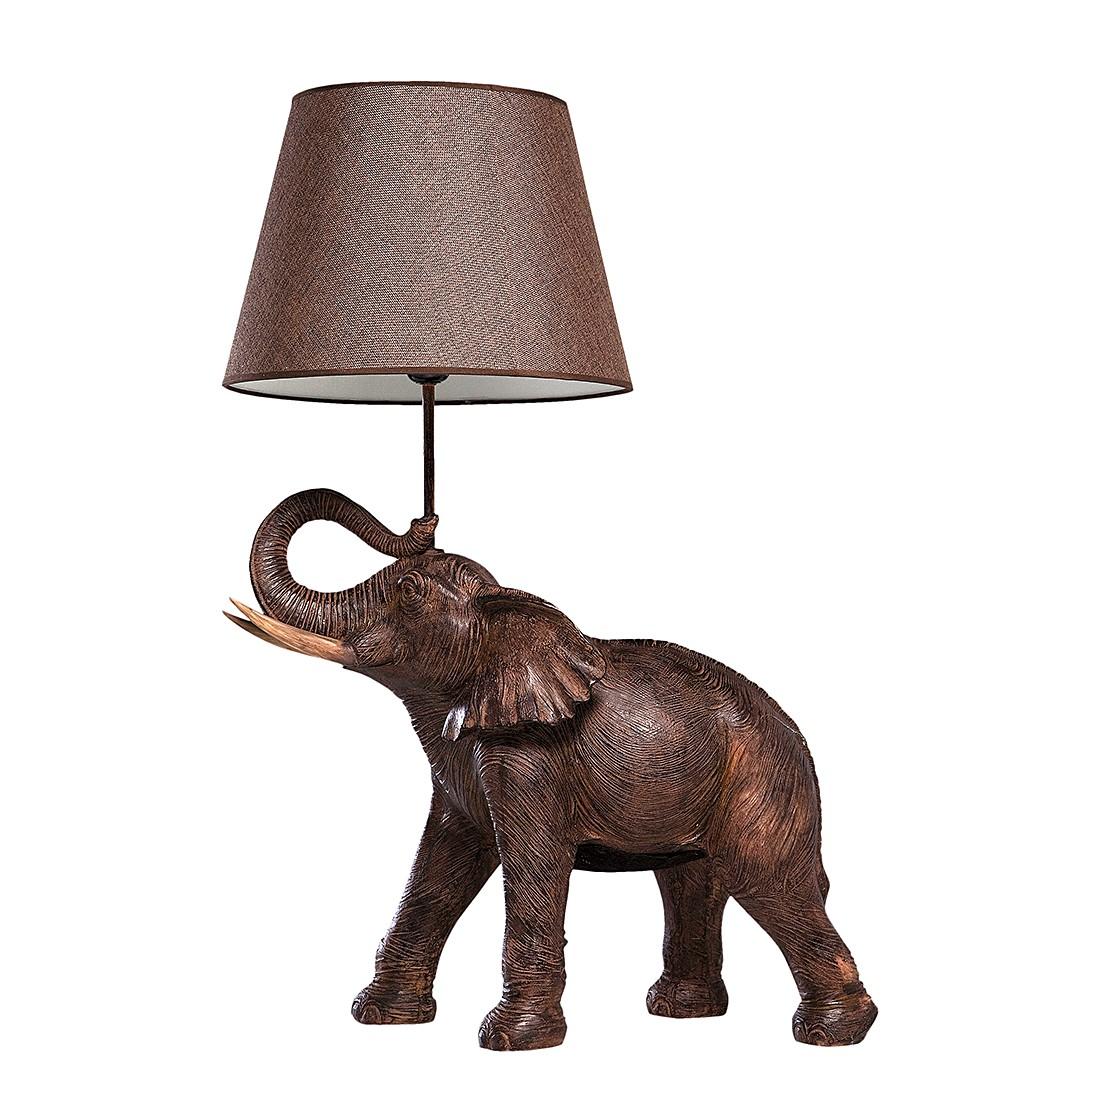 EEK A++, Tischleuchte TL Elephant Safari – Kunststoff/Stoff – 1-flammig, Kare Design günstig bestellen